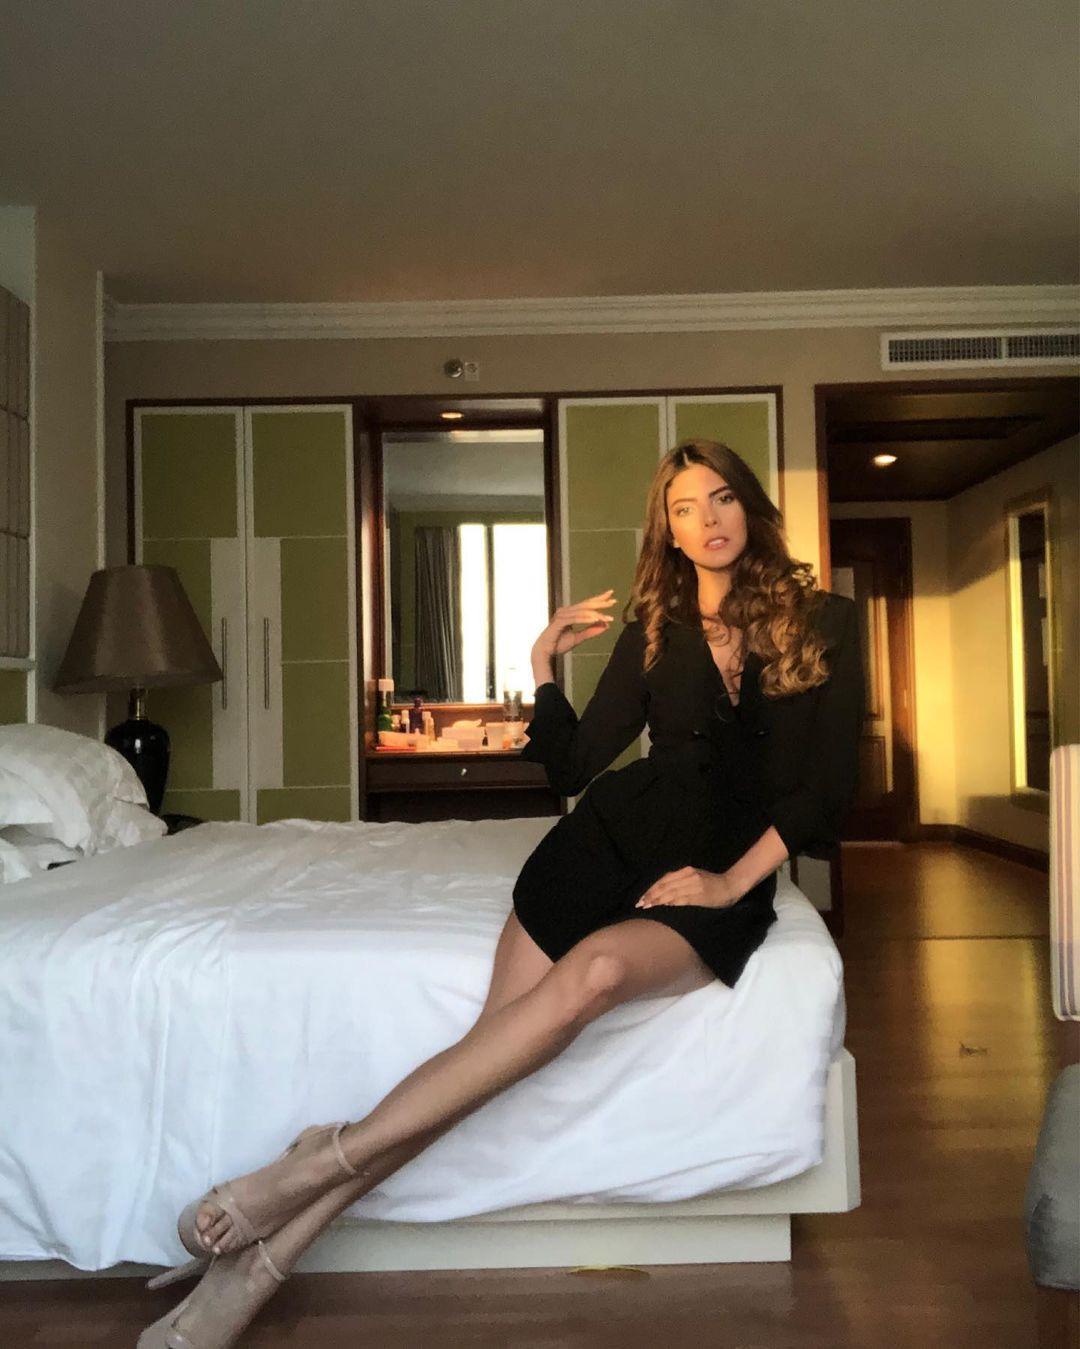 natalia manrique, miss grand colombia 2020. - Página 4 Fytze710